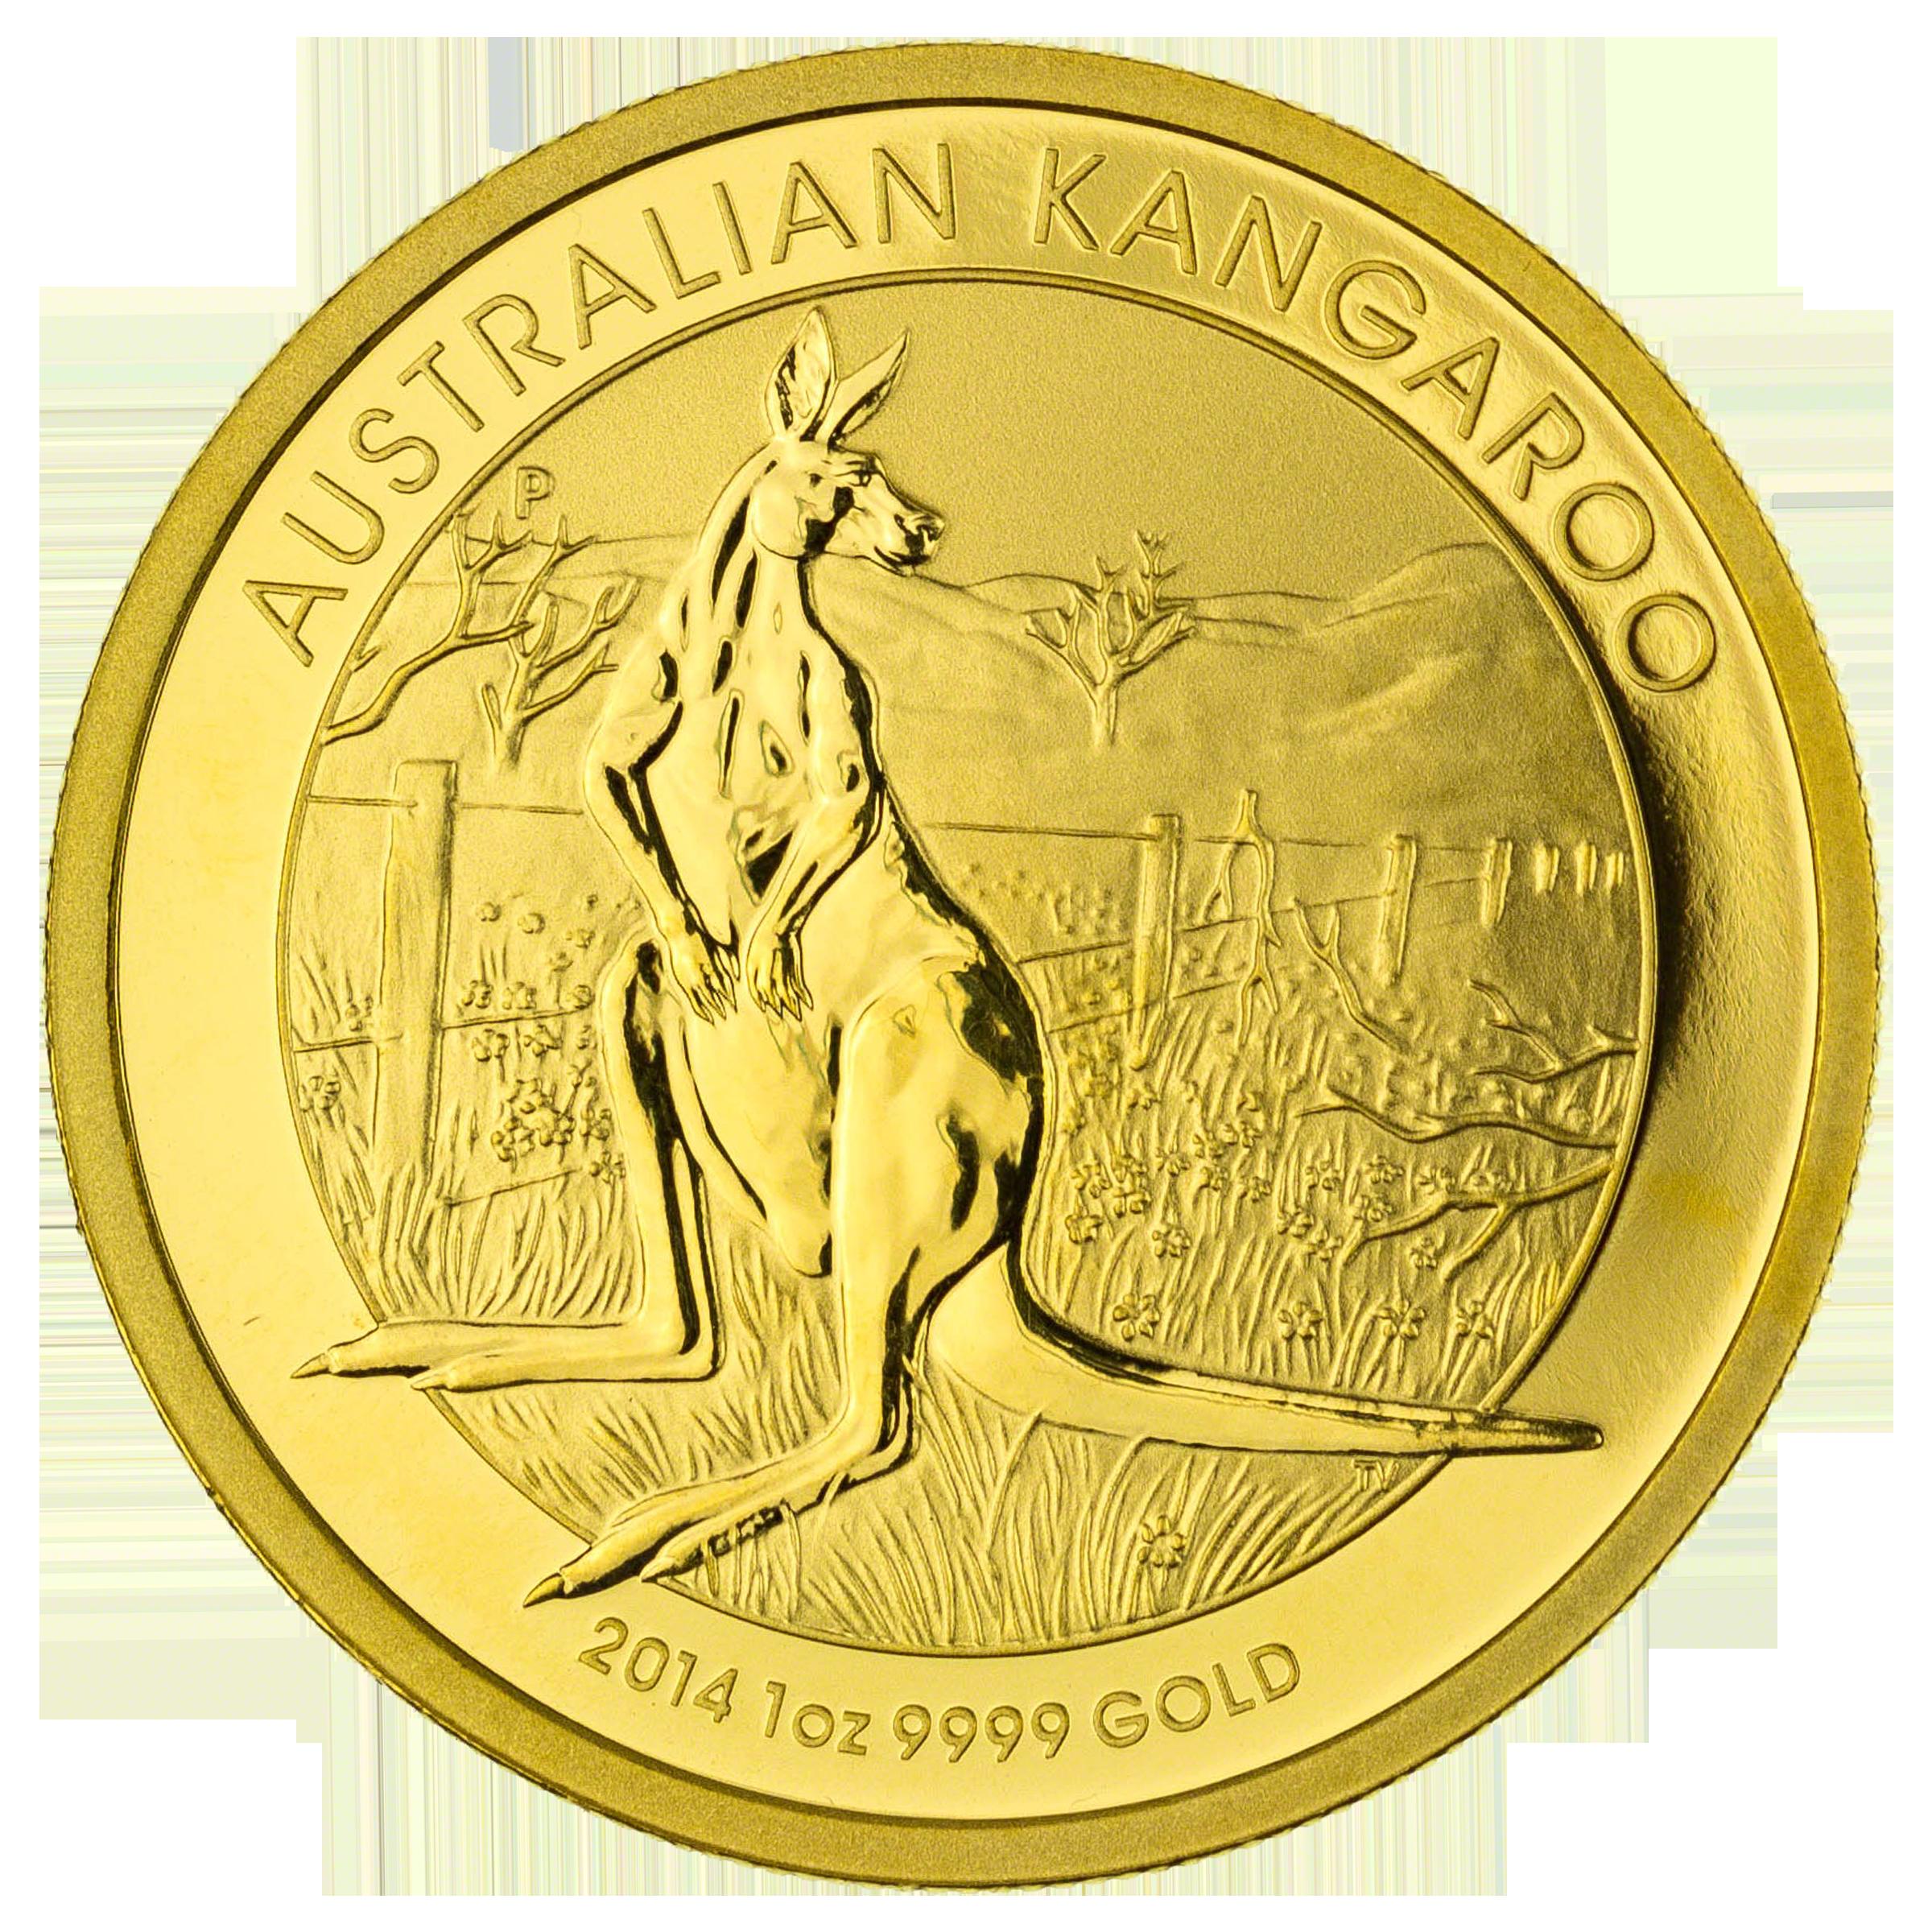 Gold Australian Platinum: Australian Gold Kangaroo Nugget 2014